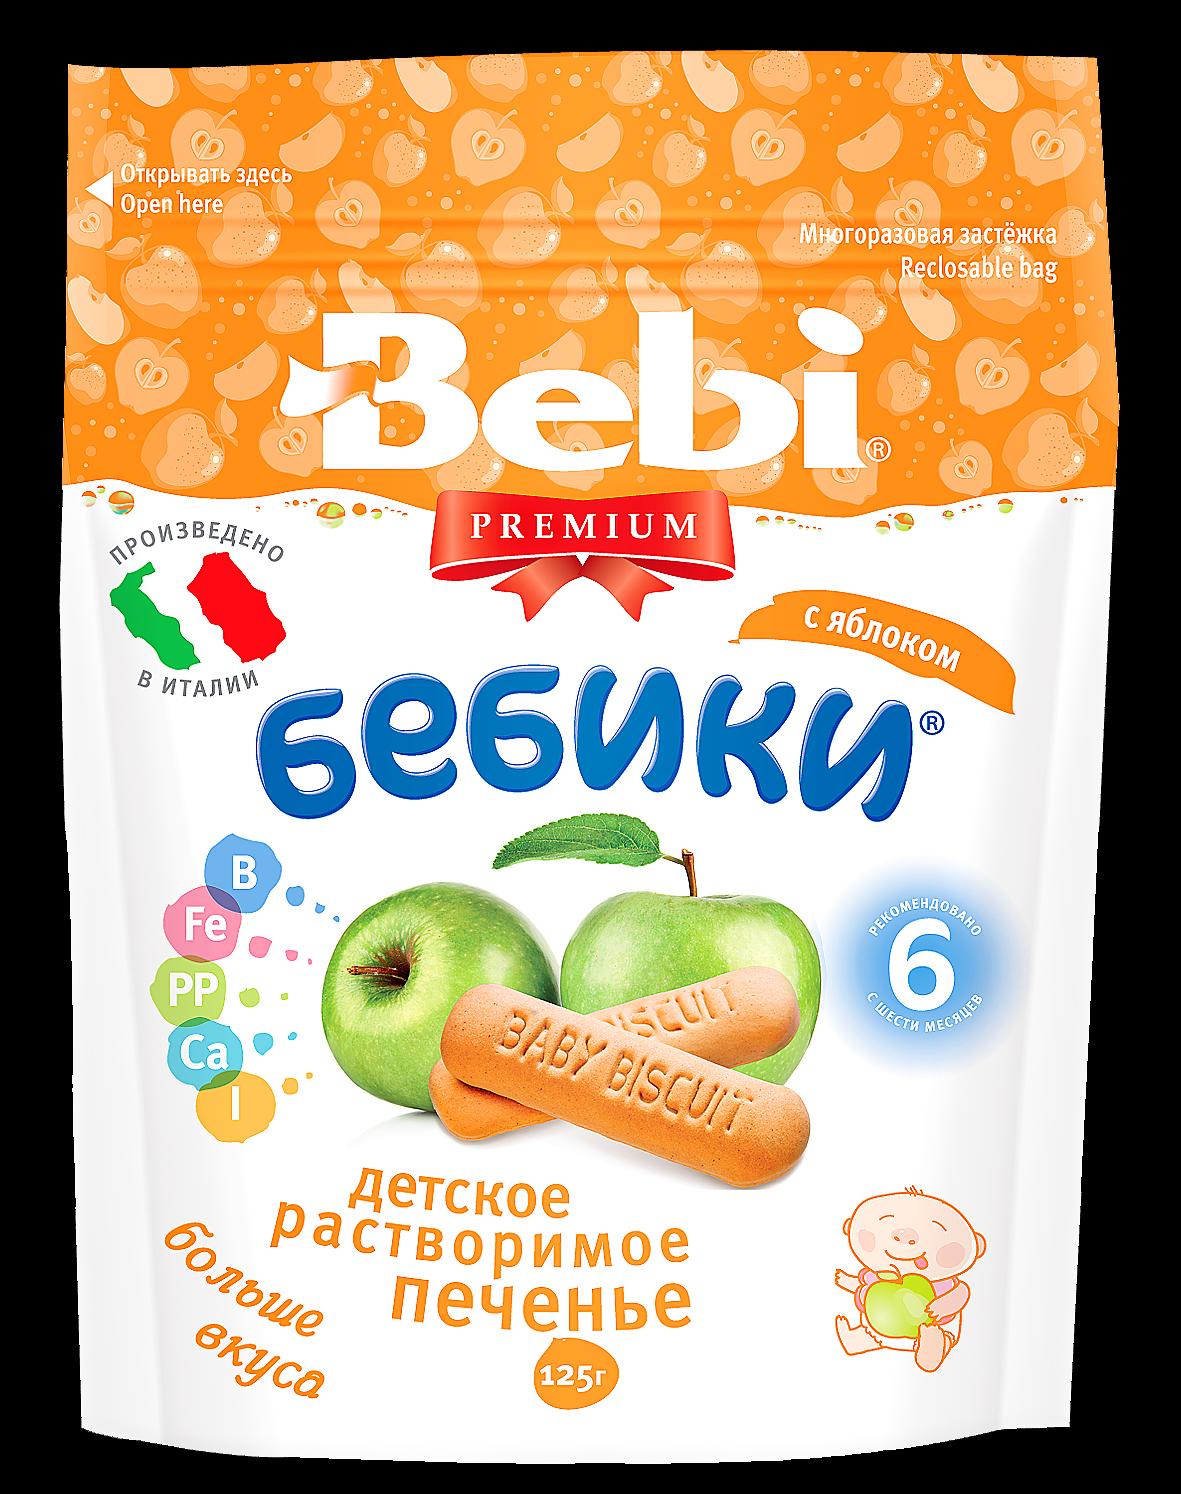 """Беби"" Детское печенье Bebi Premium ""БЕБИКИ с яблоком"" 125,0"